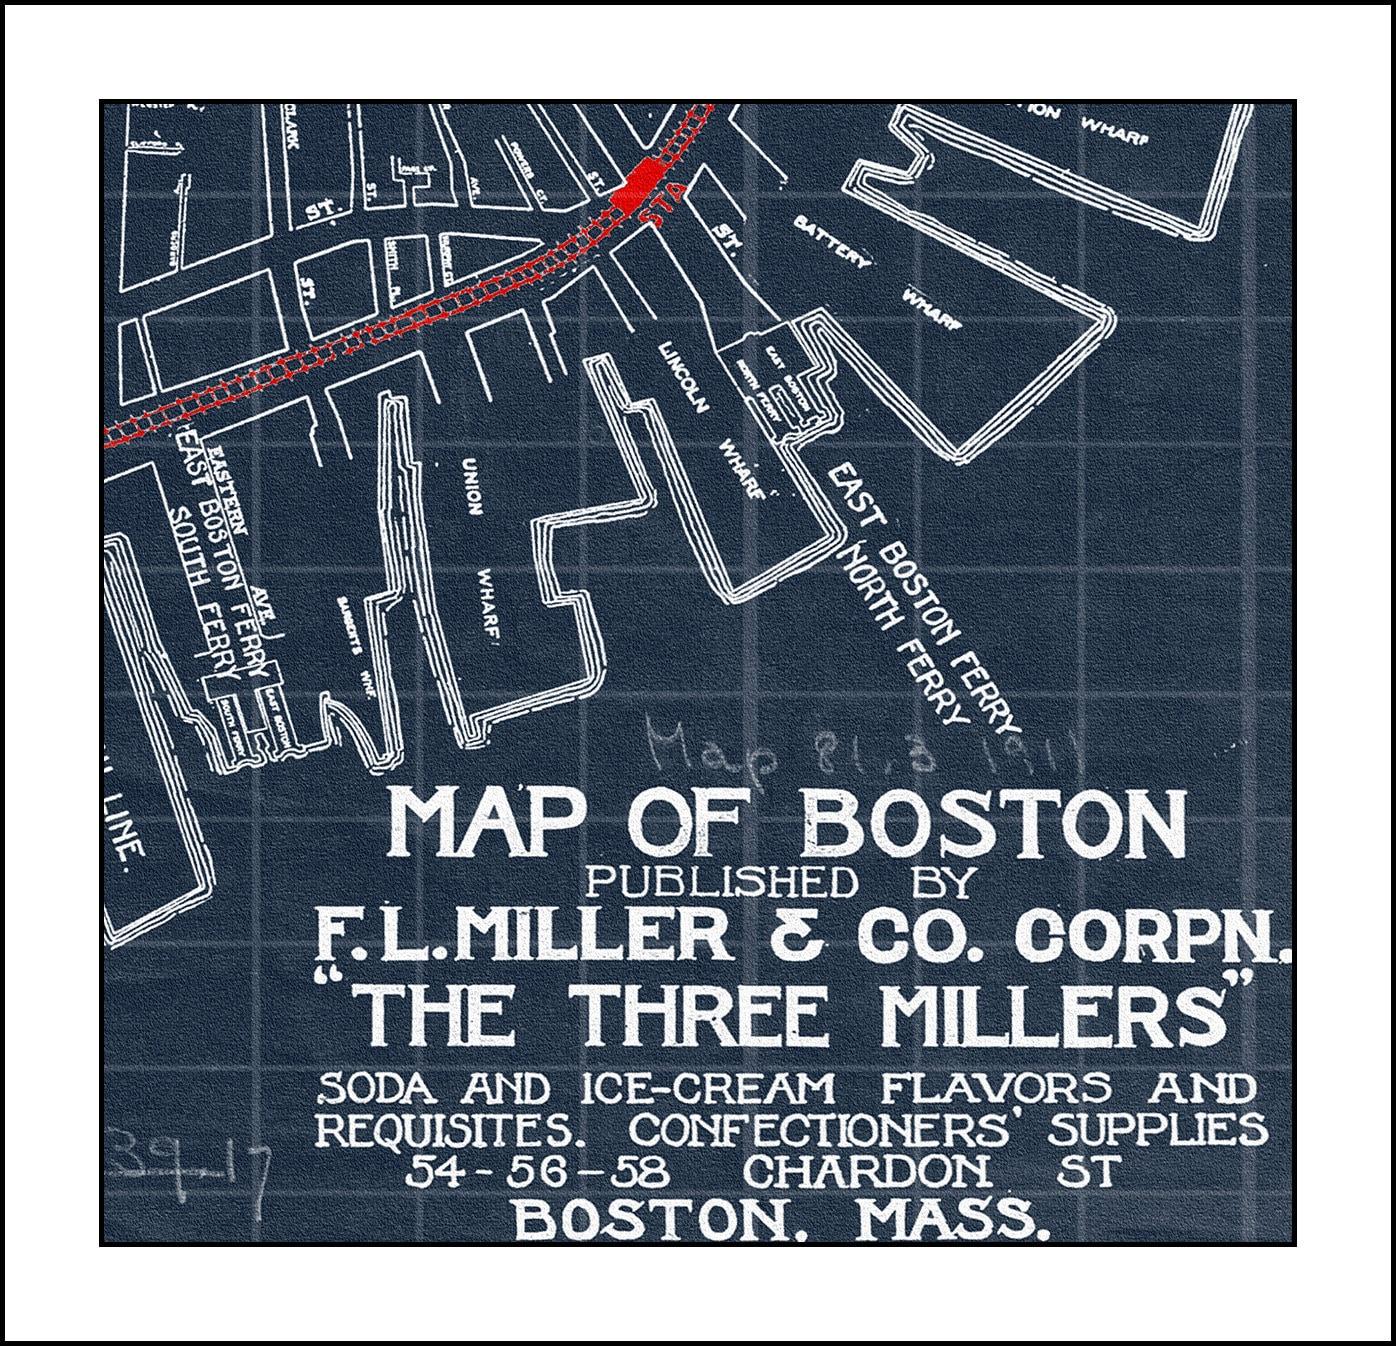 Map of boston massachusetts blueprint map boston map vintage map of boston massachusetts blueprint map boston map vintage map boston city map boston massachusetts malvernweather Images